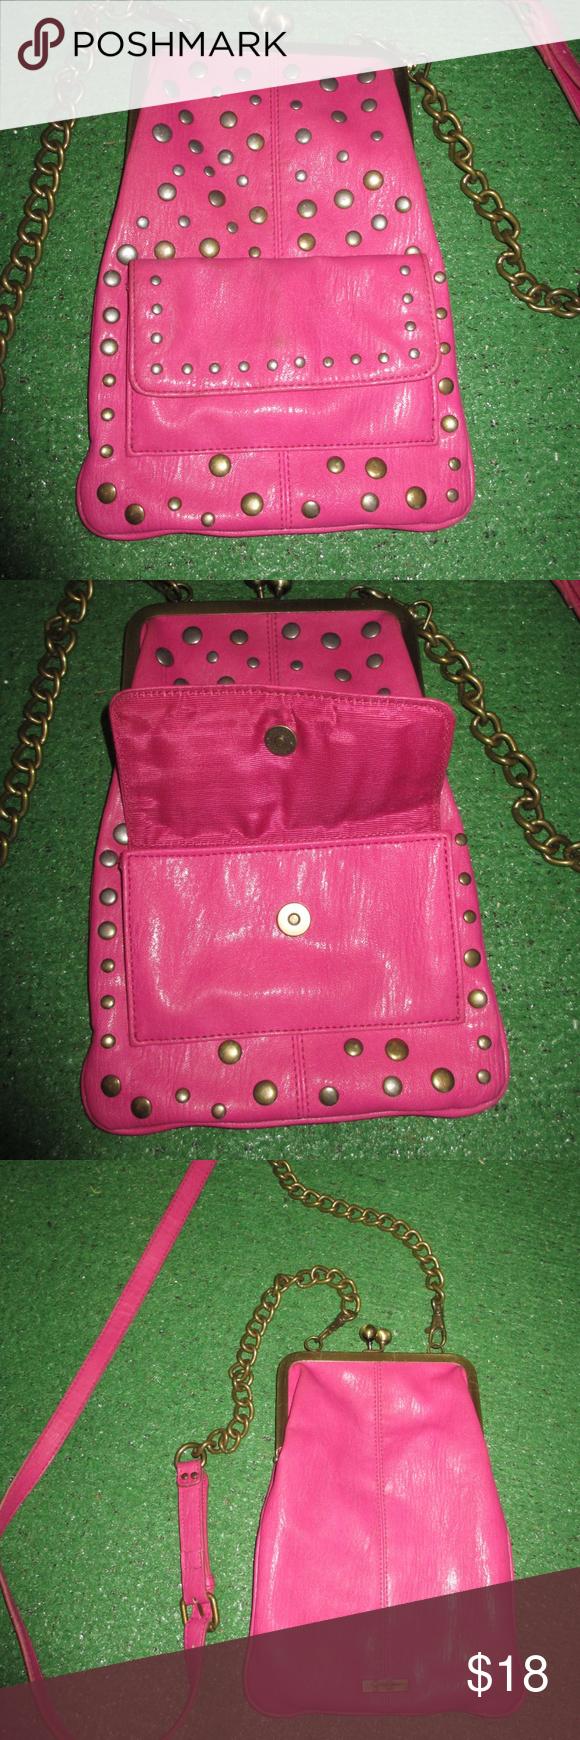 Jessica Simpson HAND BAGS shoulder bag SNAPS PINK Jessica Simpson hand bag-shoul…